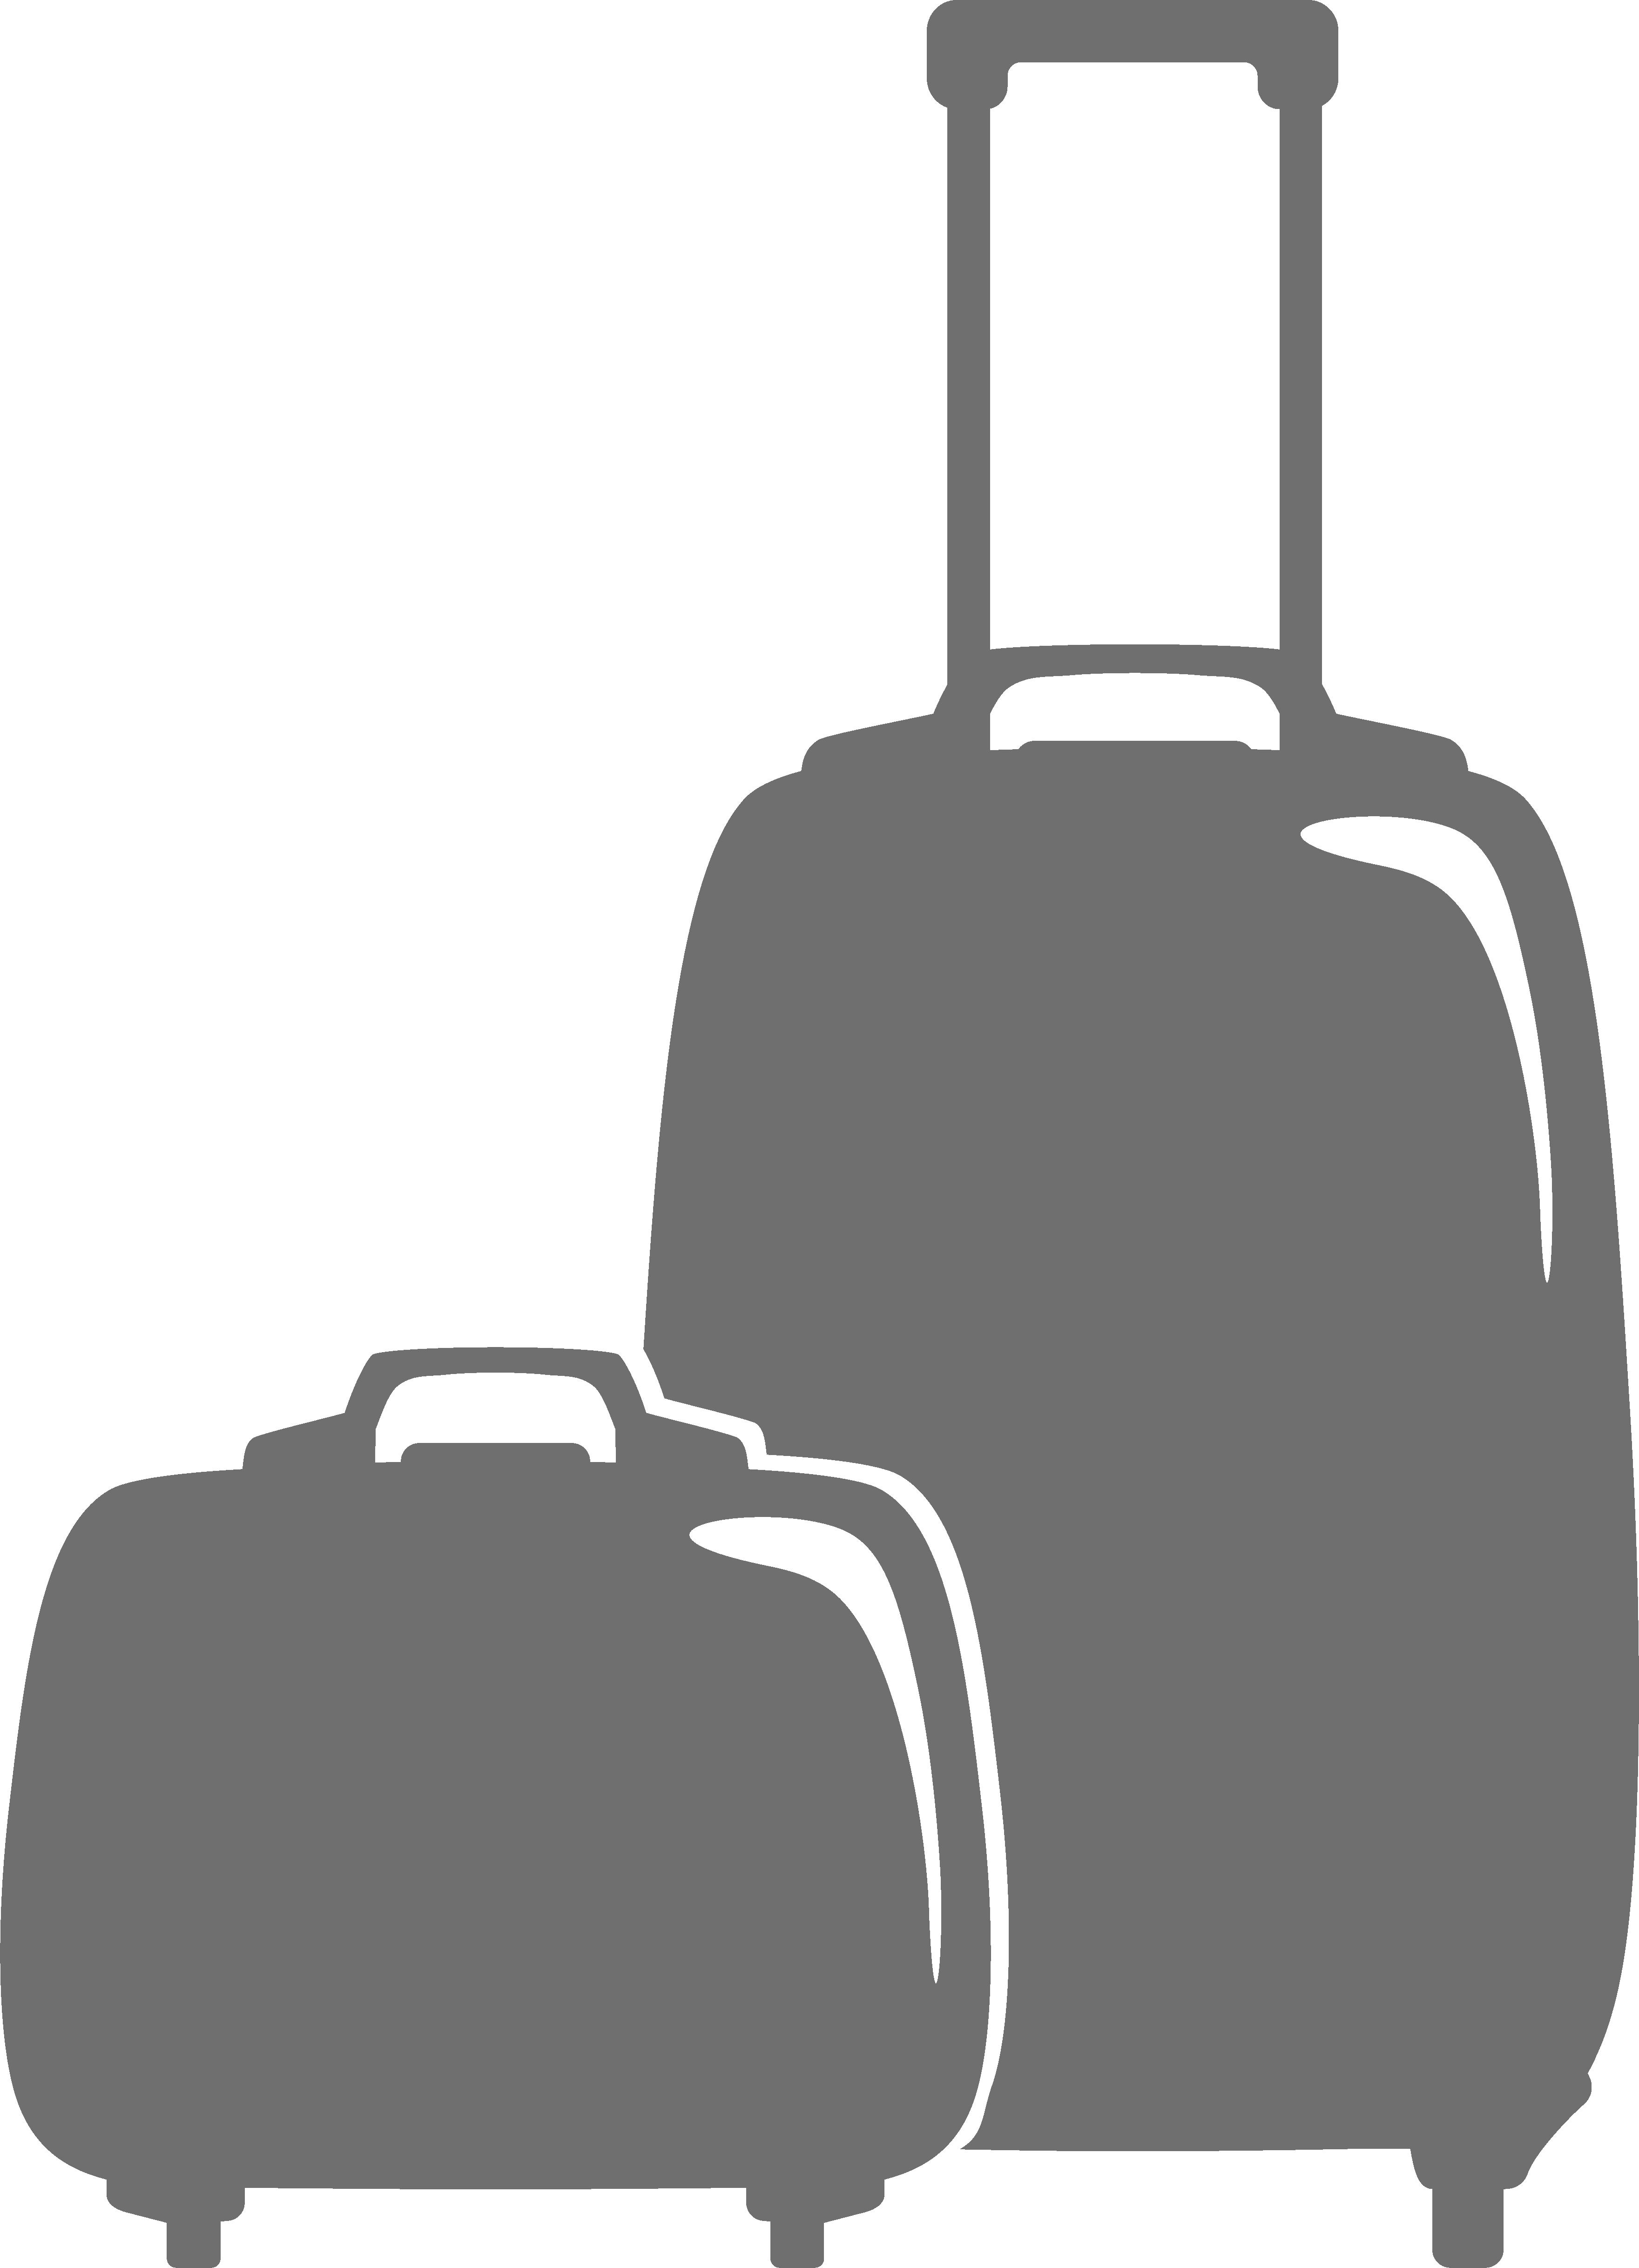 Reiskoffer | Esperanto Travel - Reisbureau Nieuwpoort